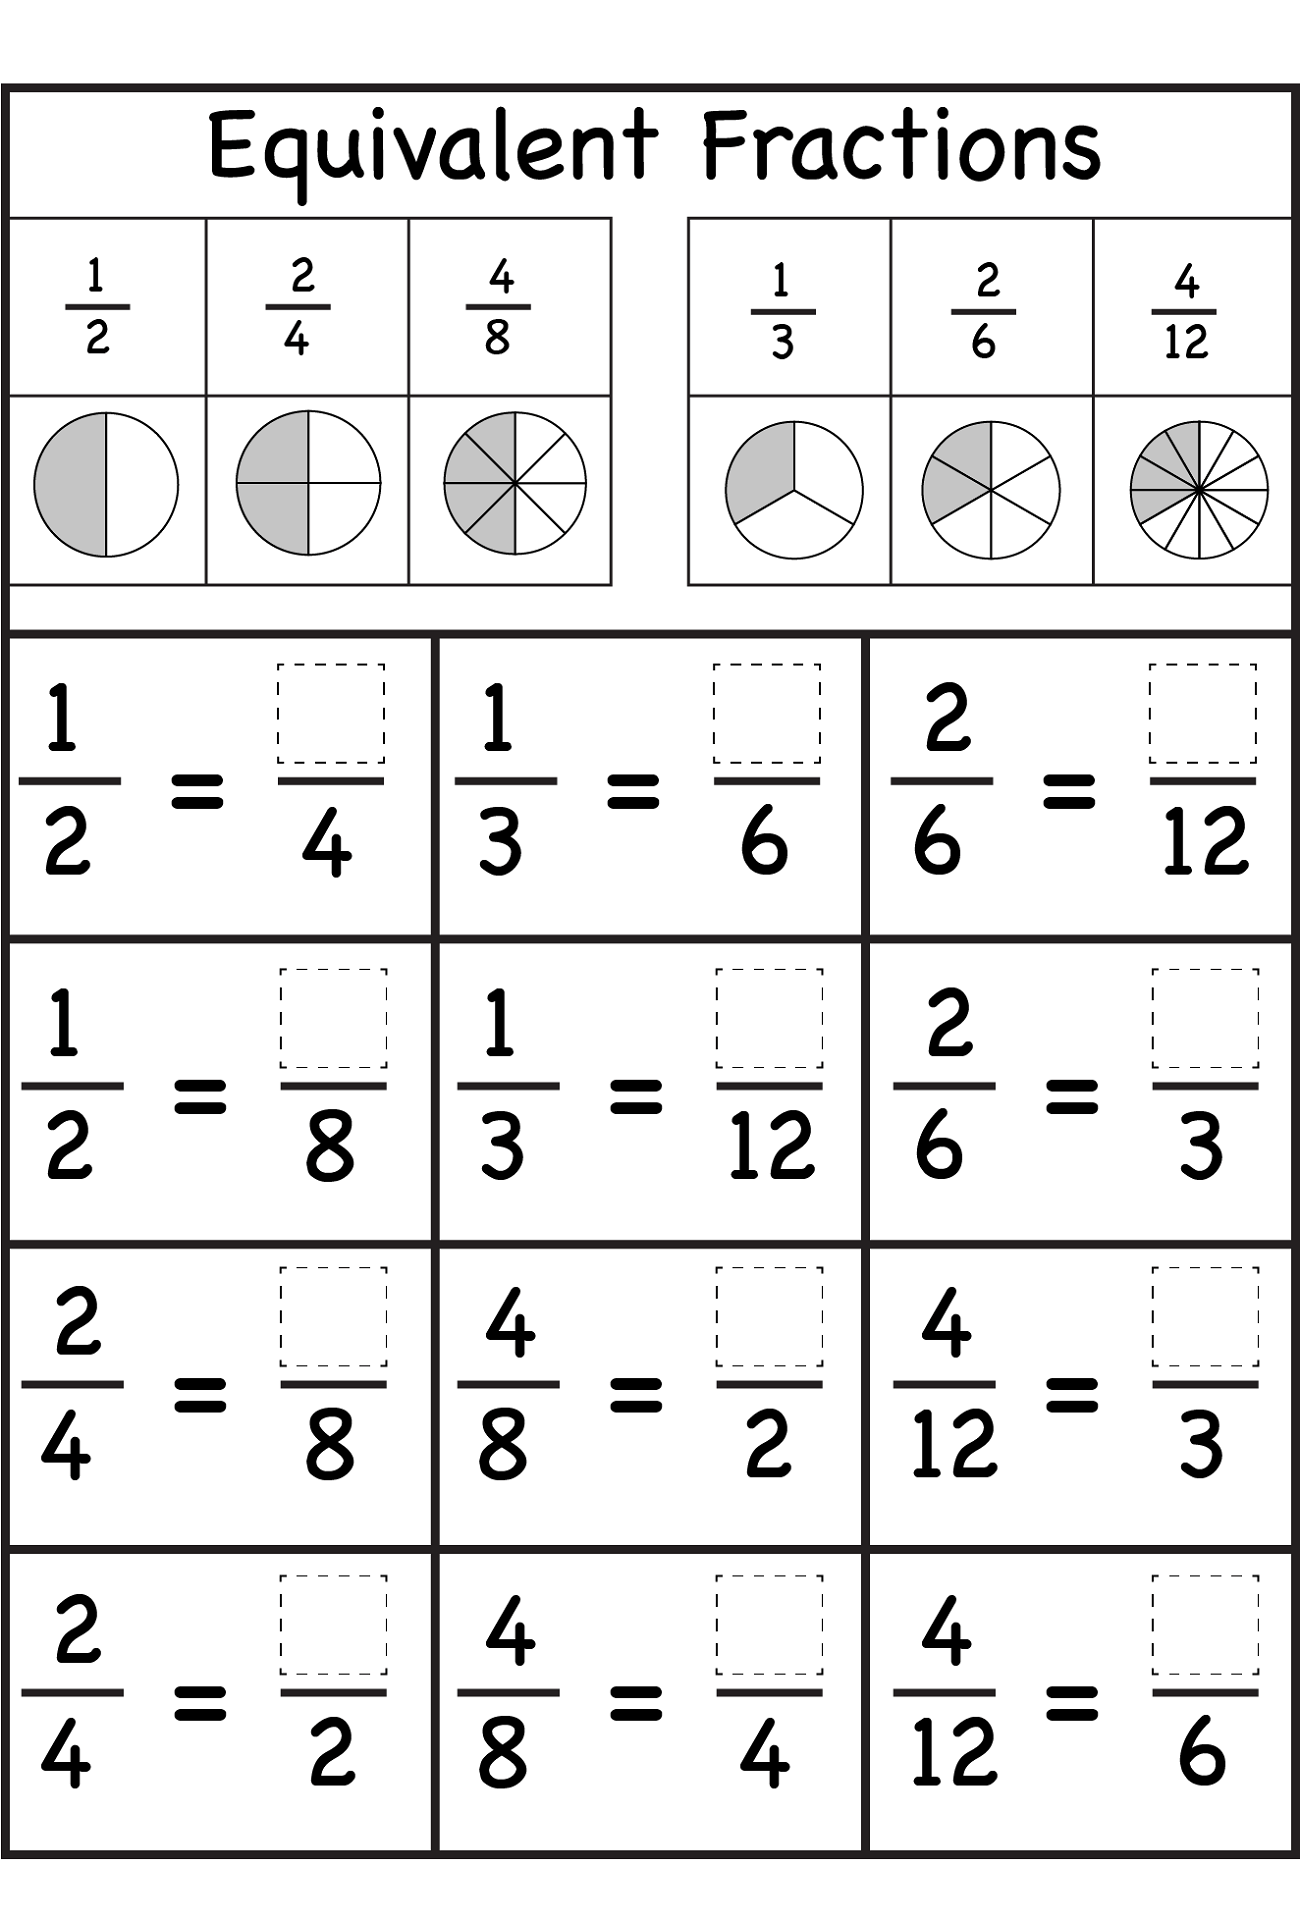 Equivalent Fractions Worksheet Math Salamanders